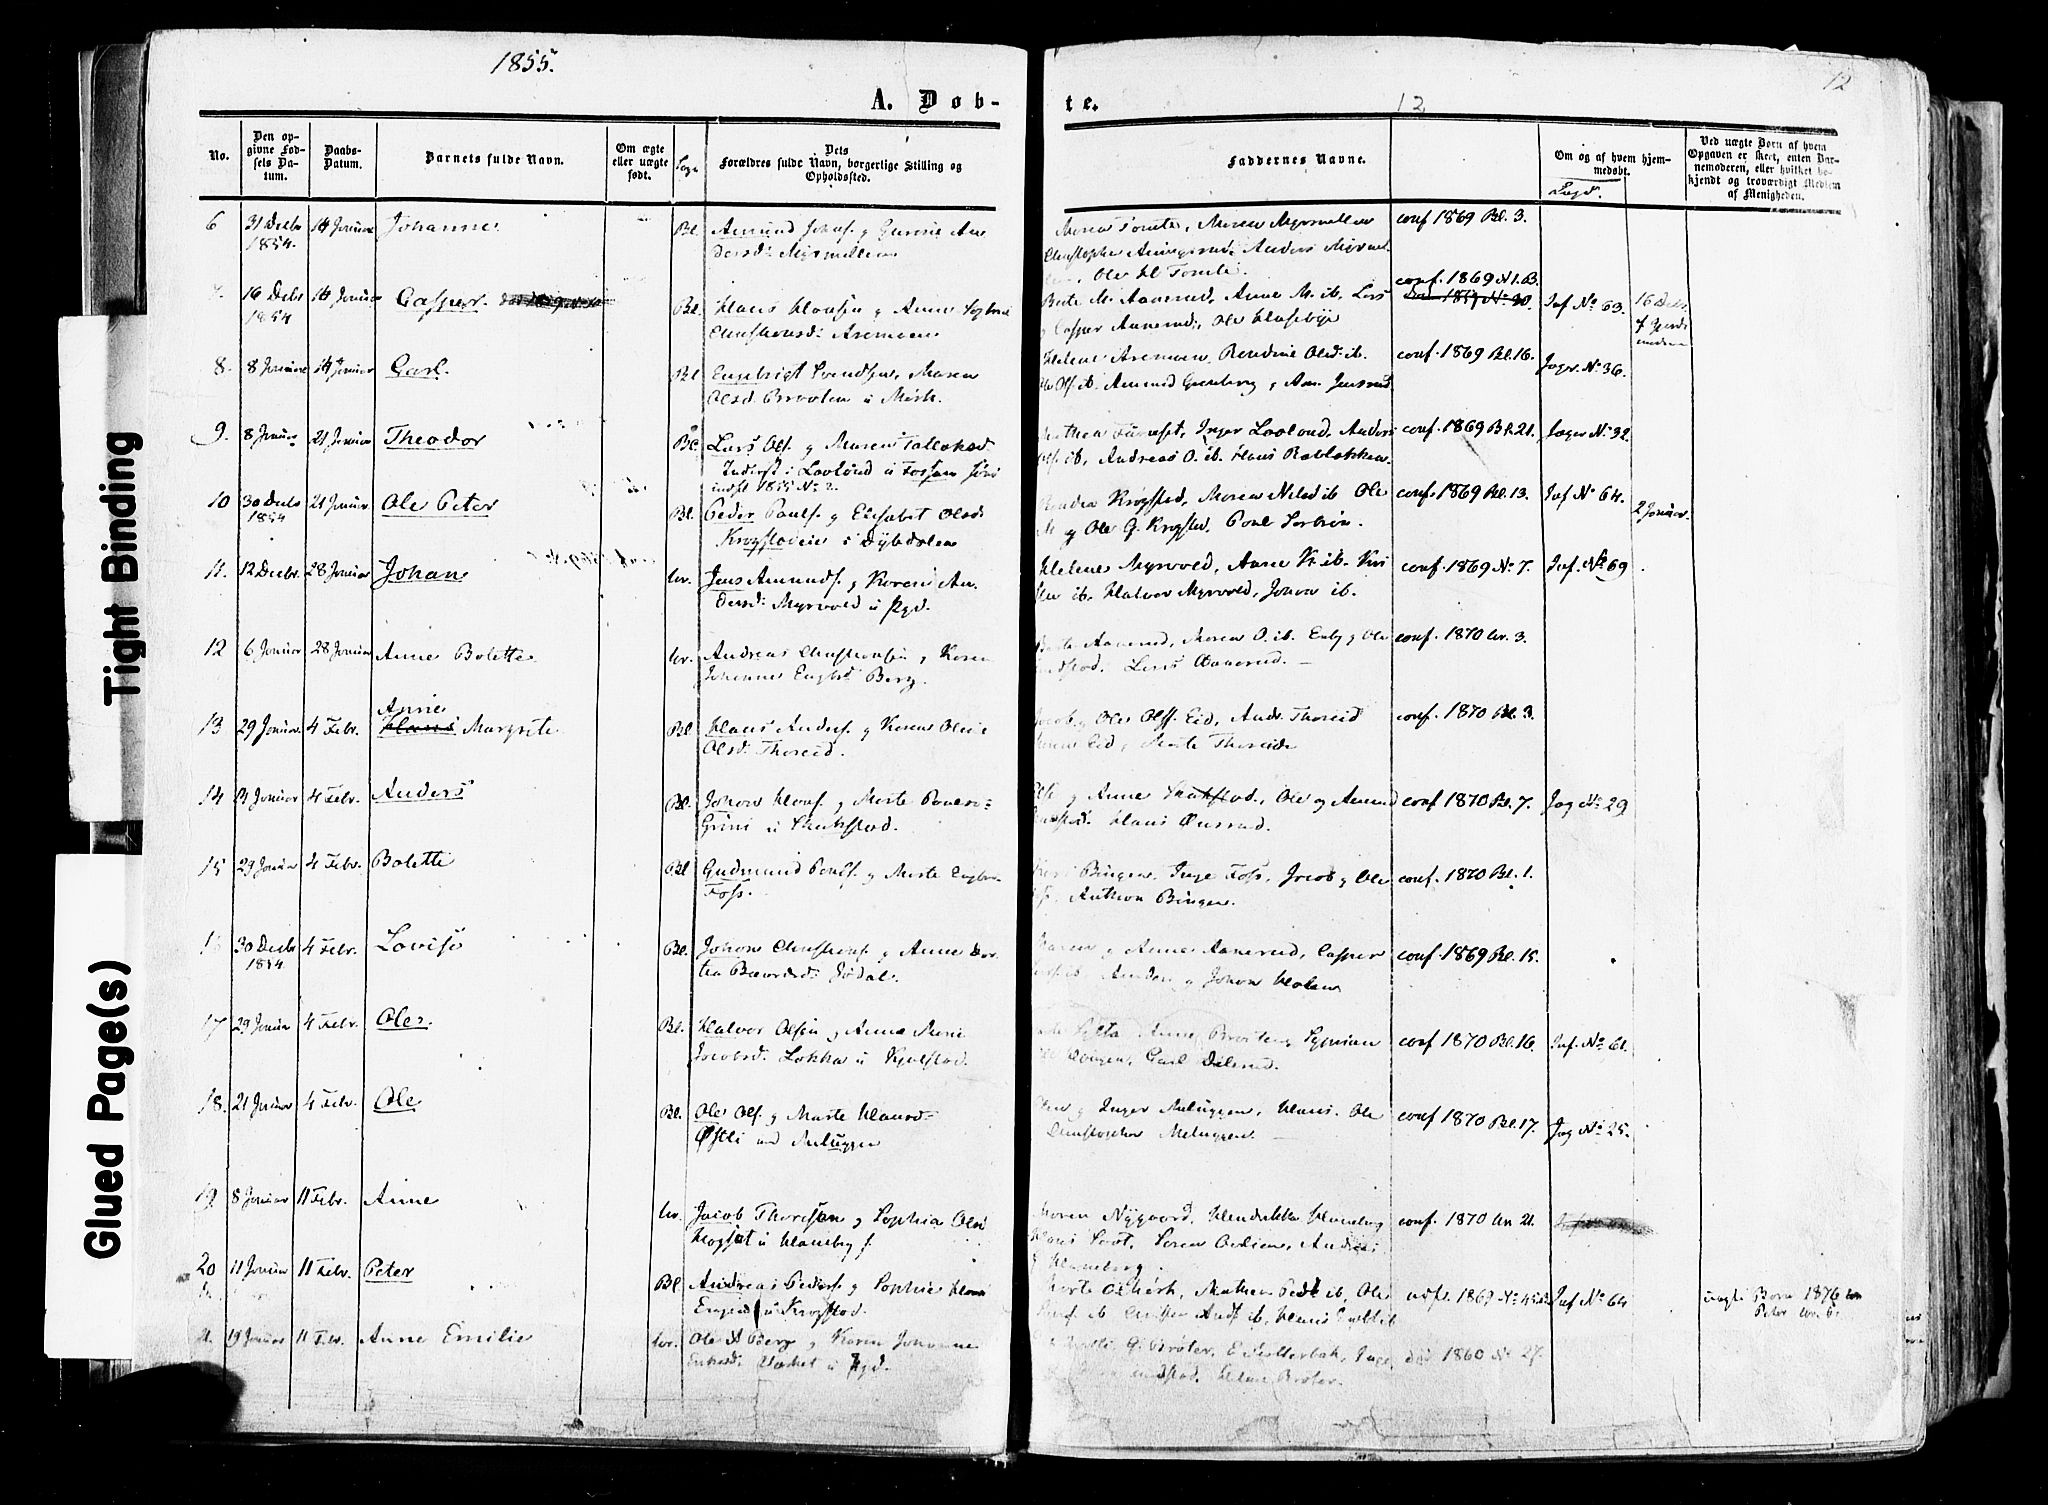 SAO, Aurskog prestekontor Kirkebøker, F/Fa/L0007: Ministerialbok nr. I 7, 1854-1877, s. 12